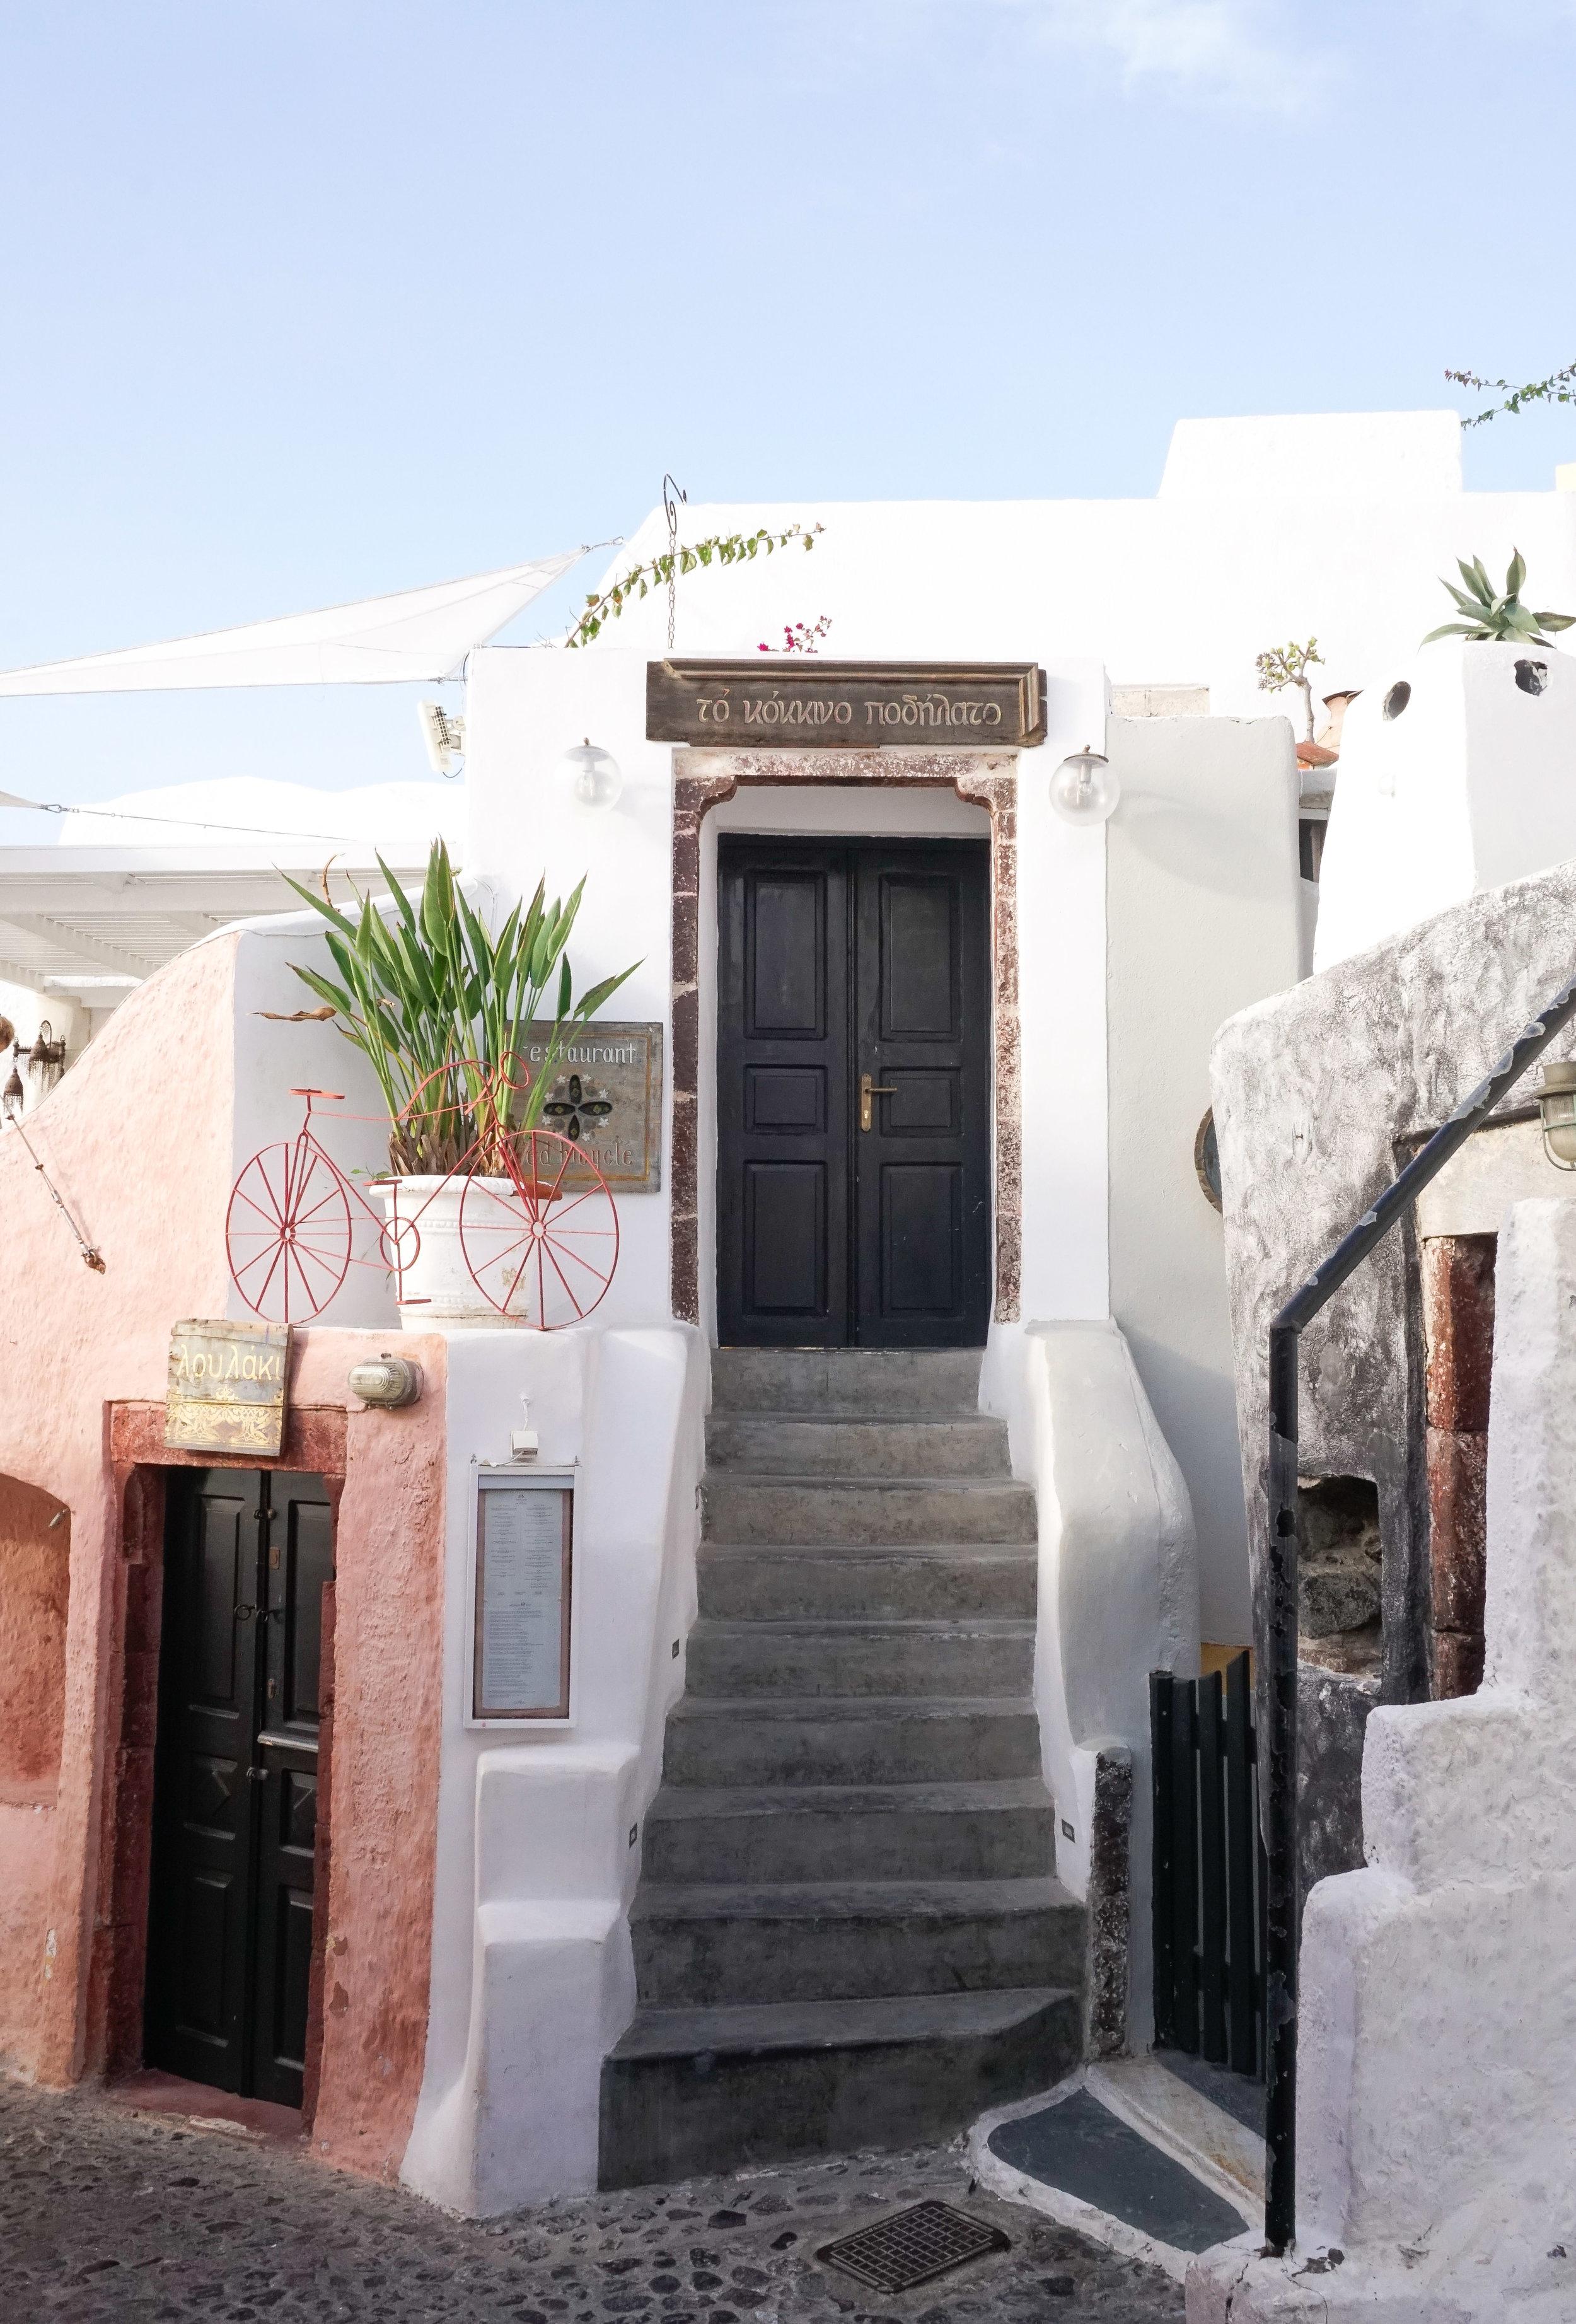 curio.trips.greece.santorini.street.scene.portrait.jpg